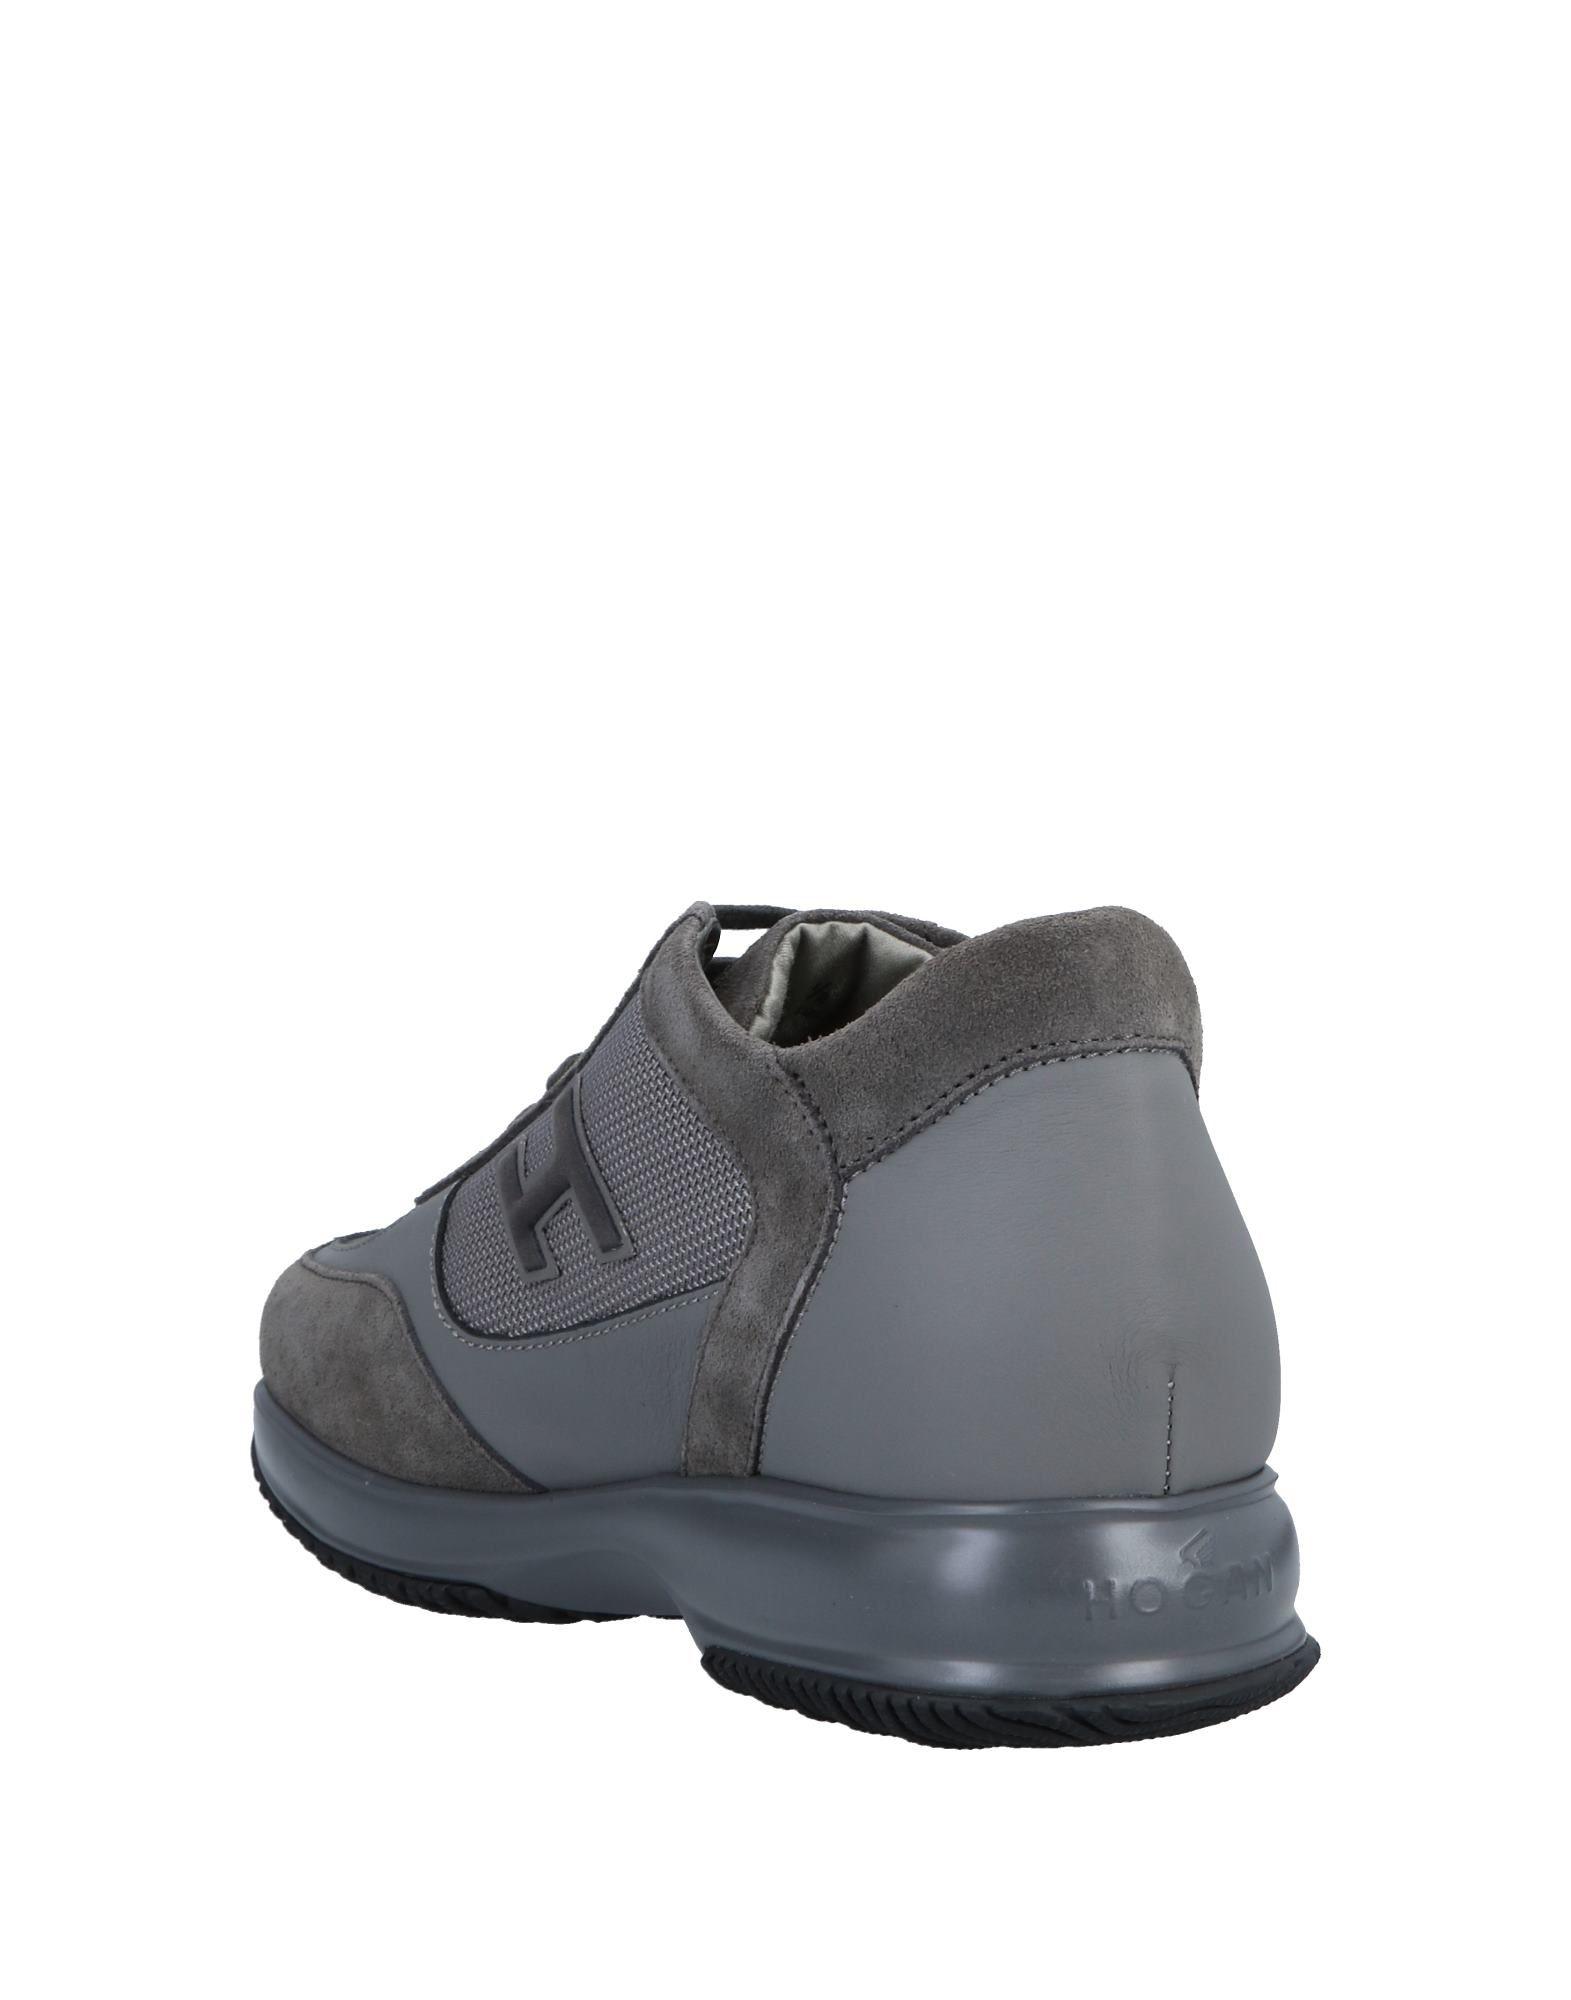 Hogan Sneakers Herren  11559746US Schuhe Gute Qualität beliebte Schuhe 11559746US 71952f